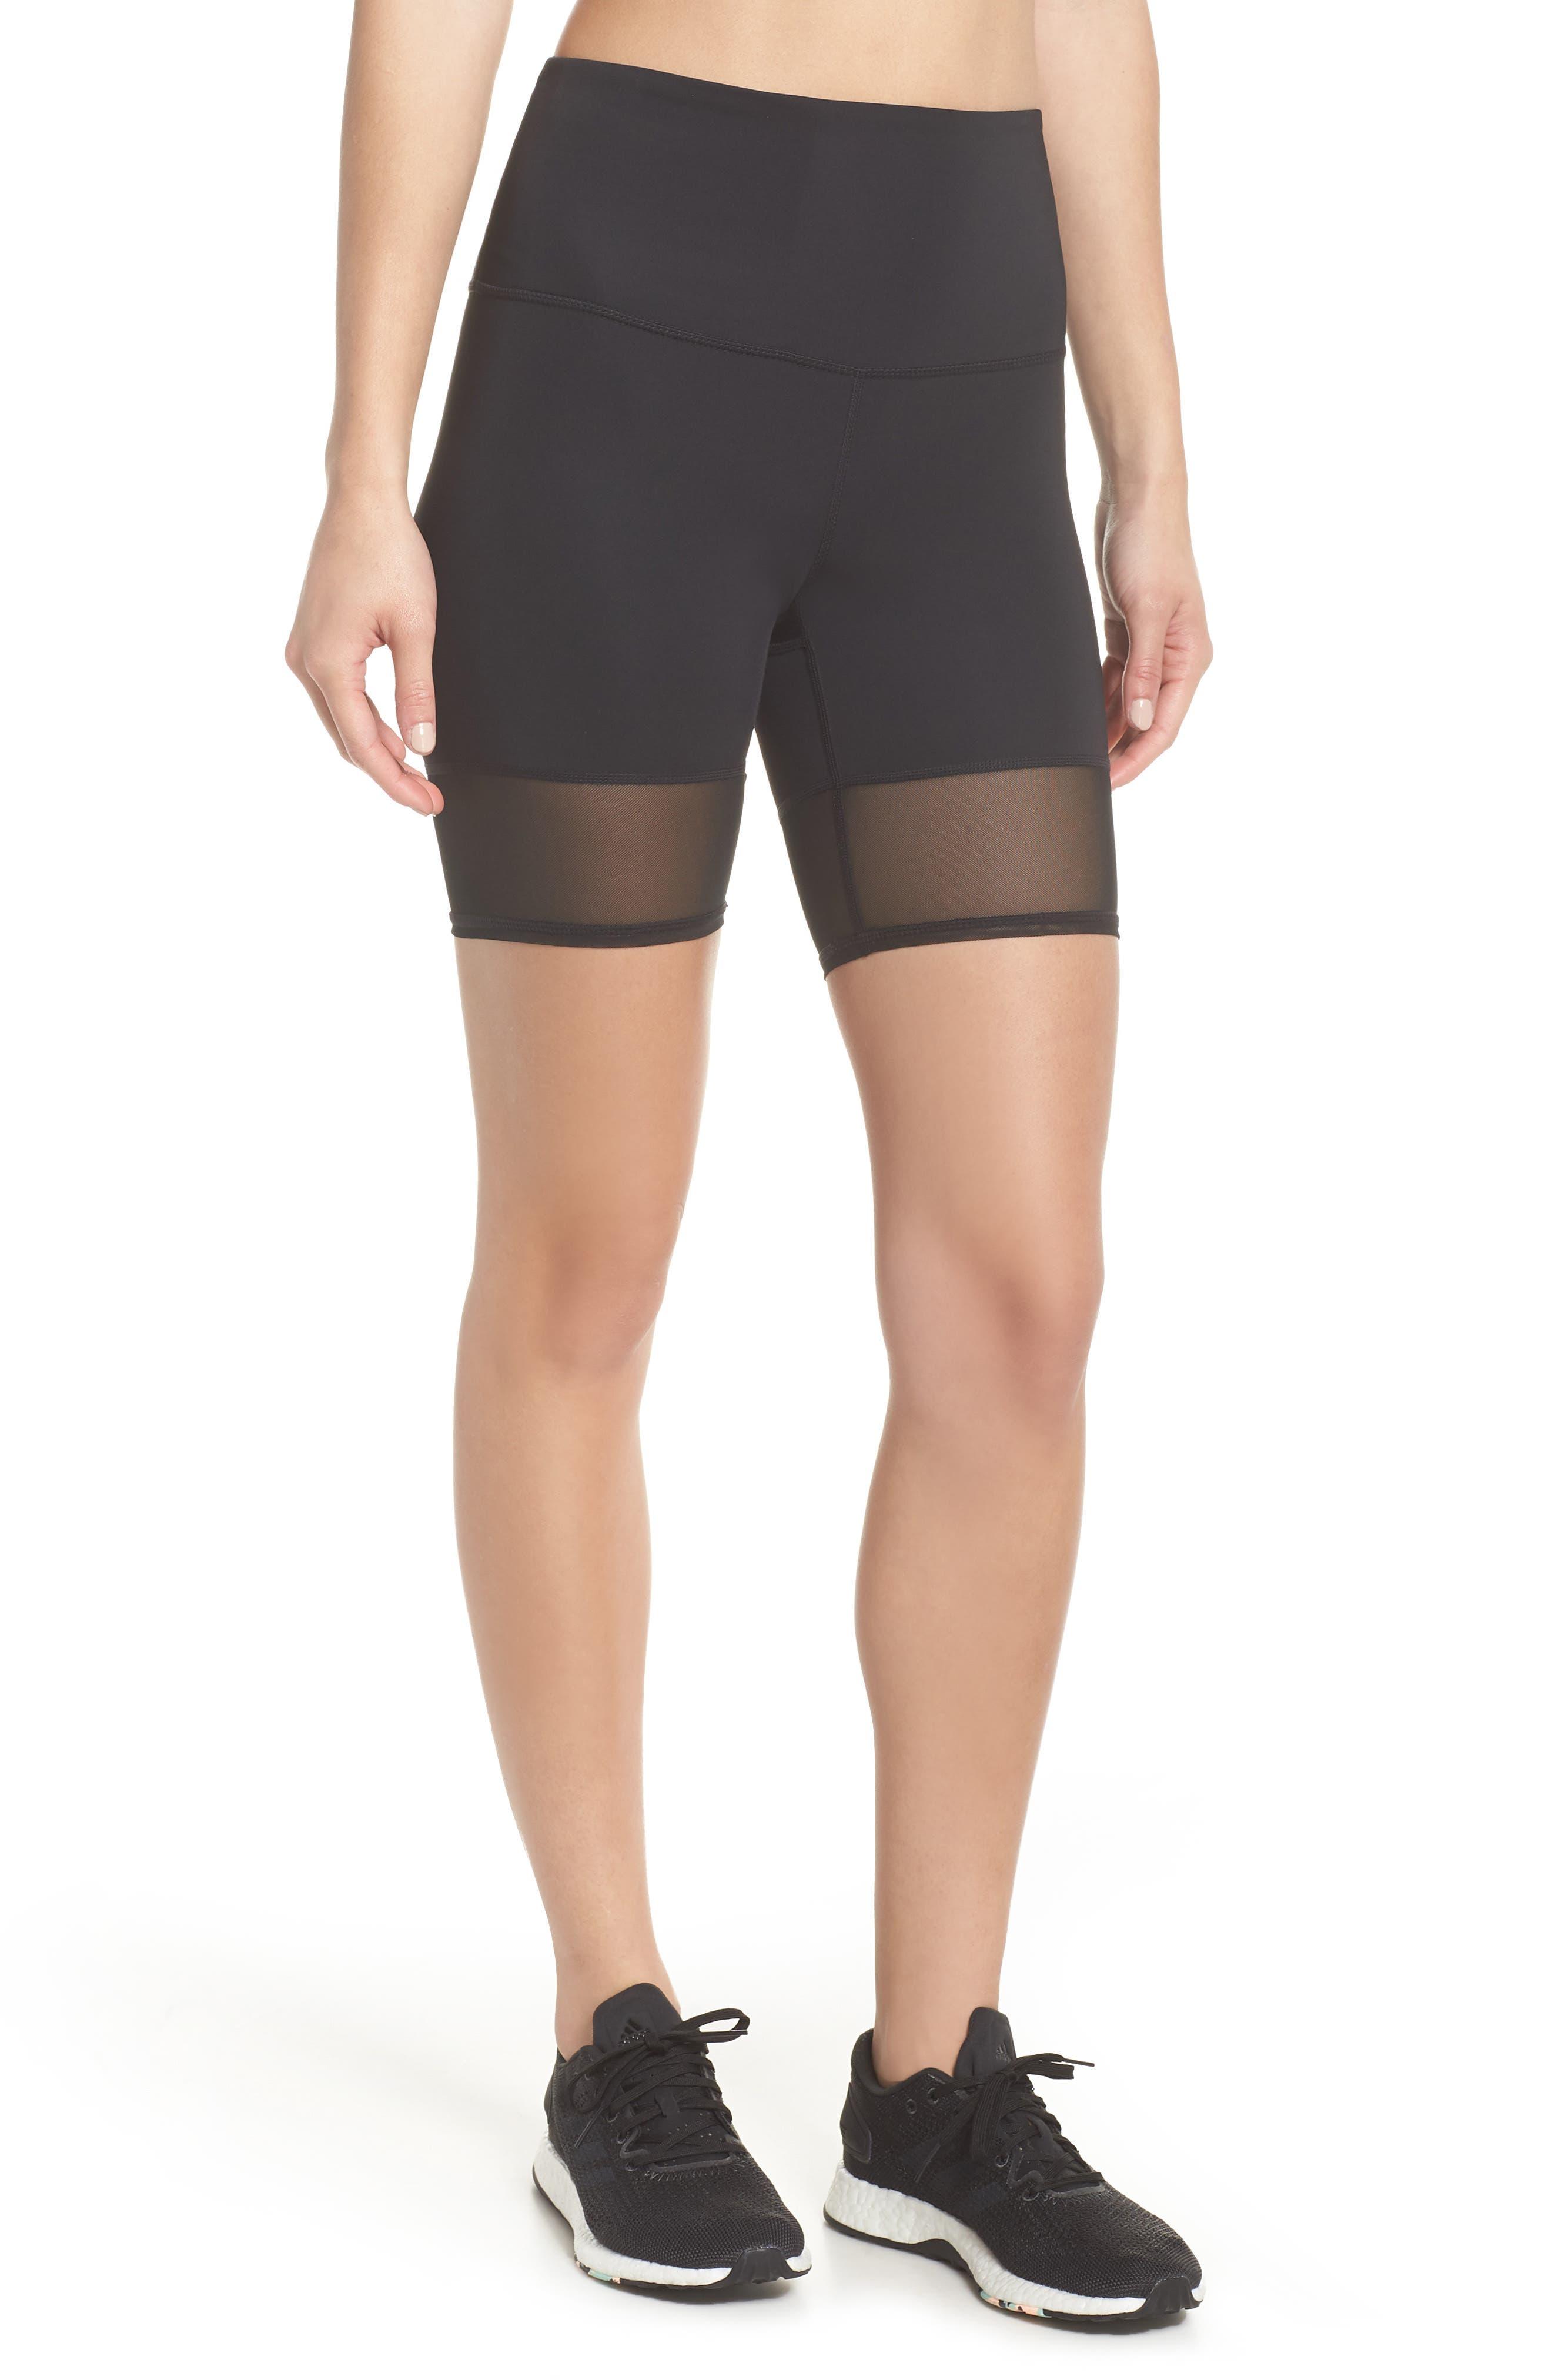 Mia Vision High Waist Mesh Bike Shorts,                             Main thumbnail 1, color,                             Black